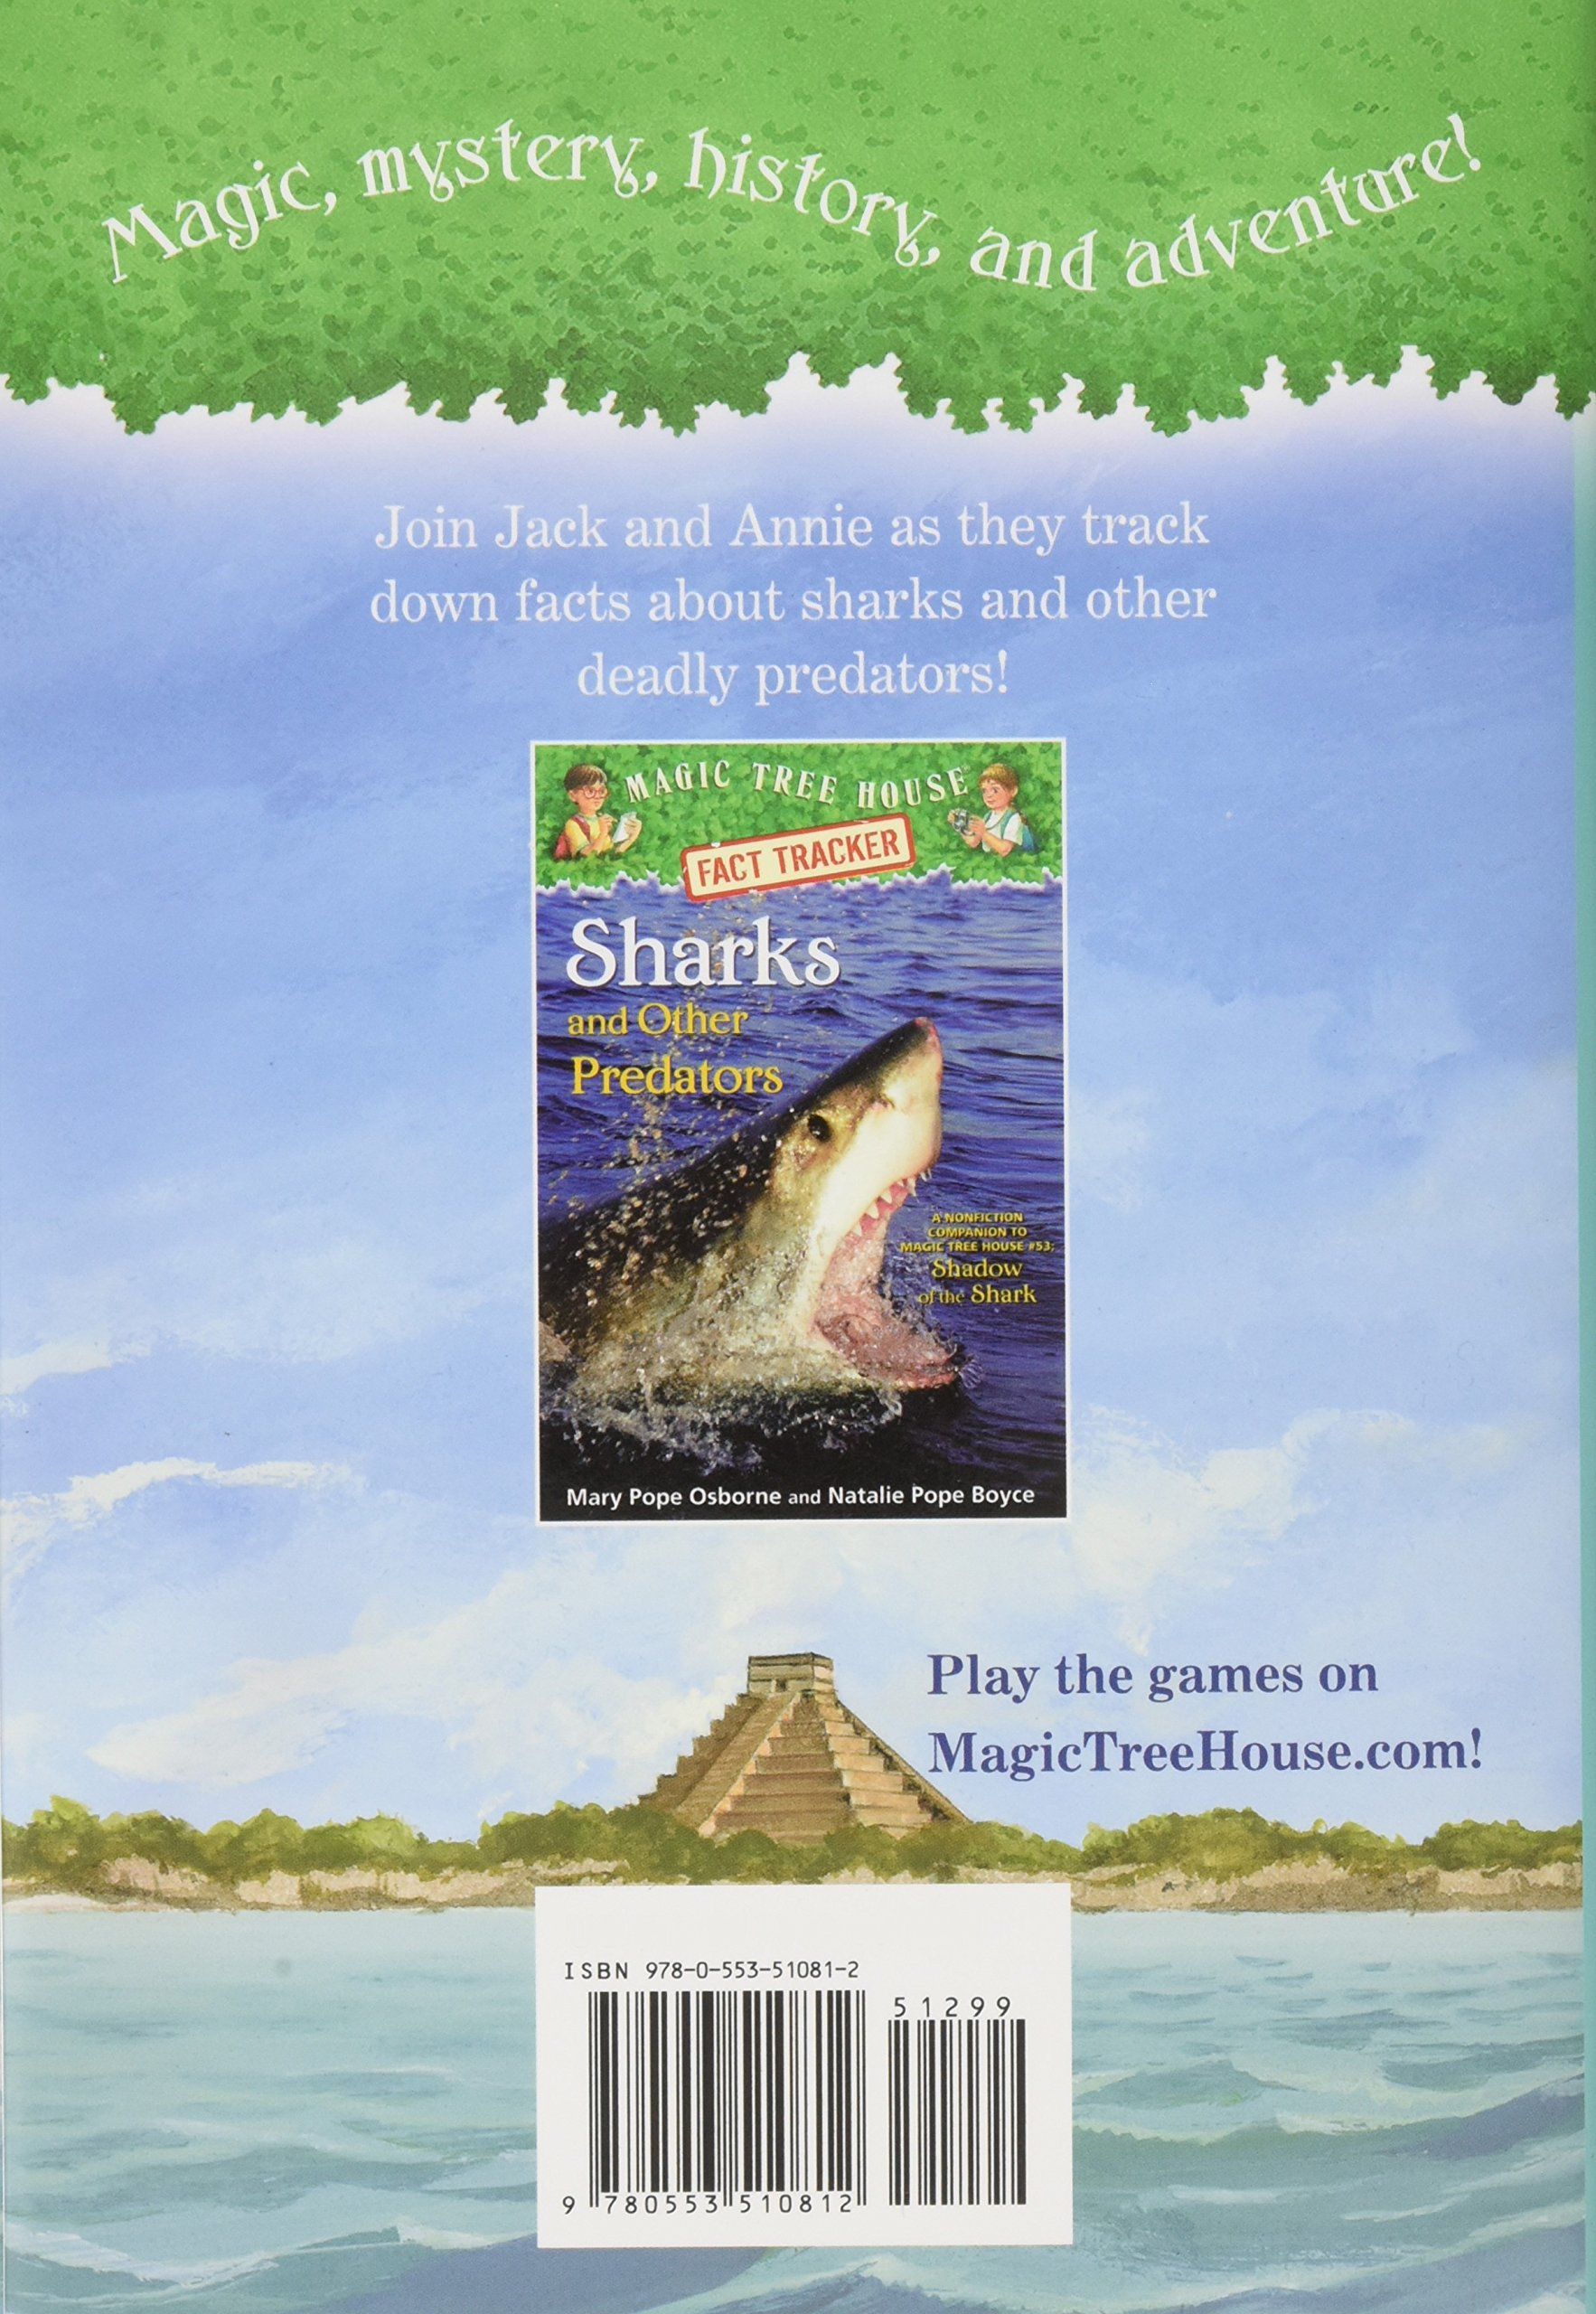 amazon com shadow of the shark magic tree house r merlin